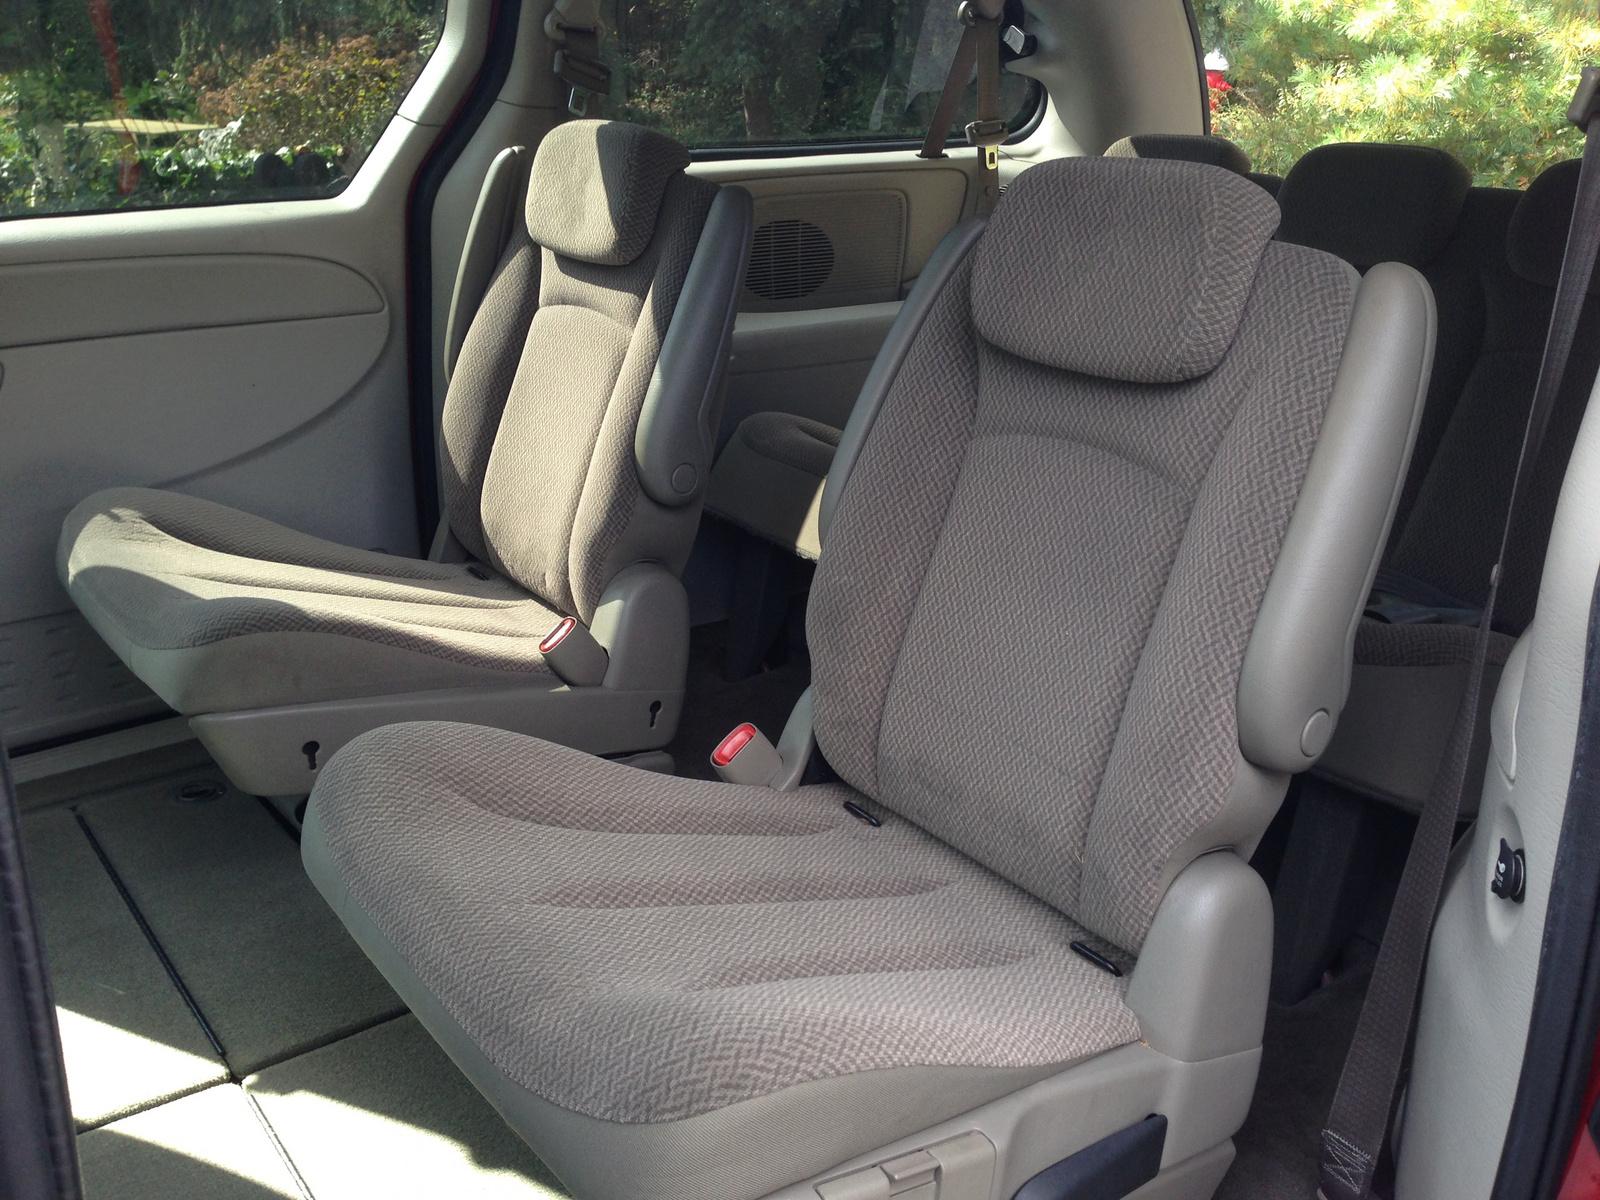 2006 Dodge Grand Caravan Specifications Cargurus ...